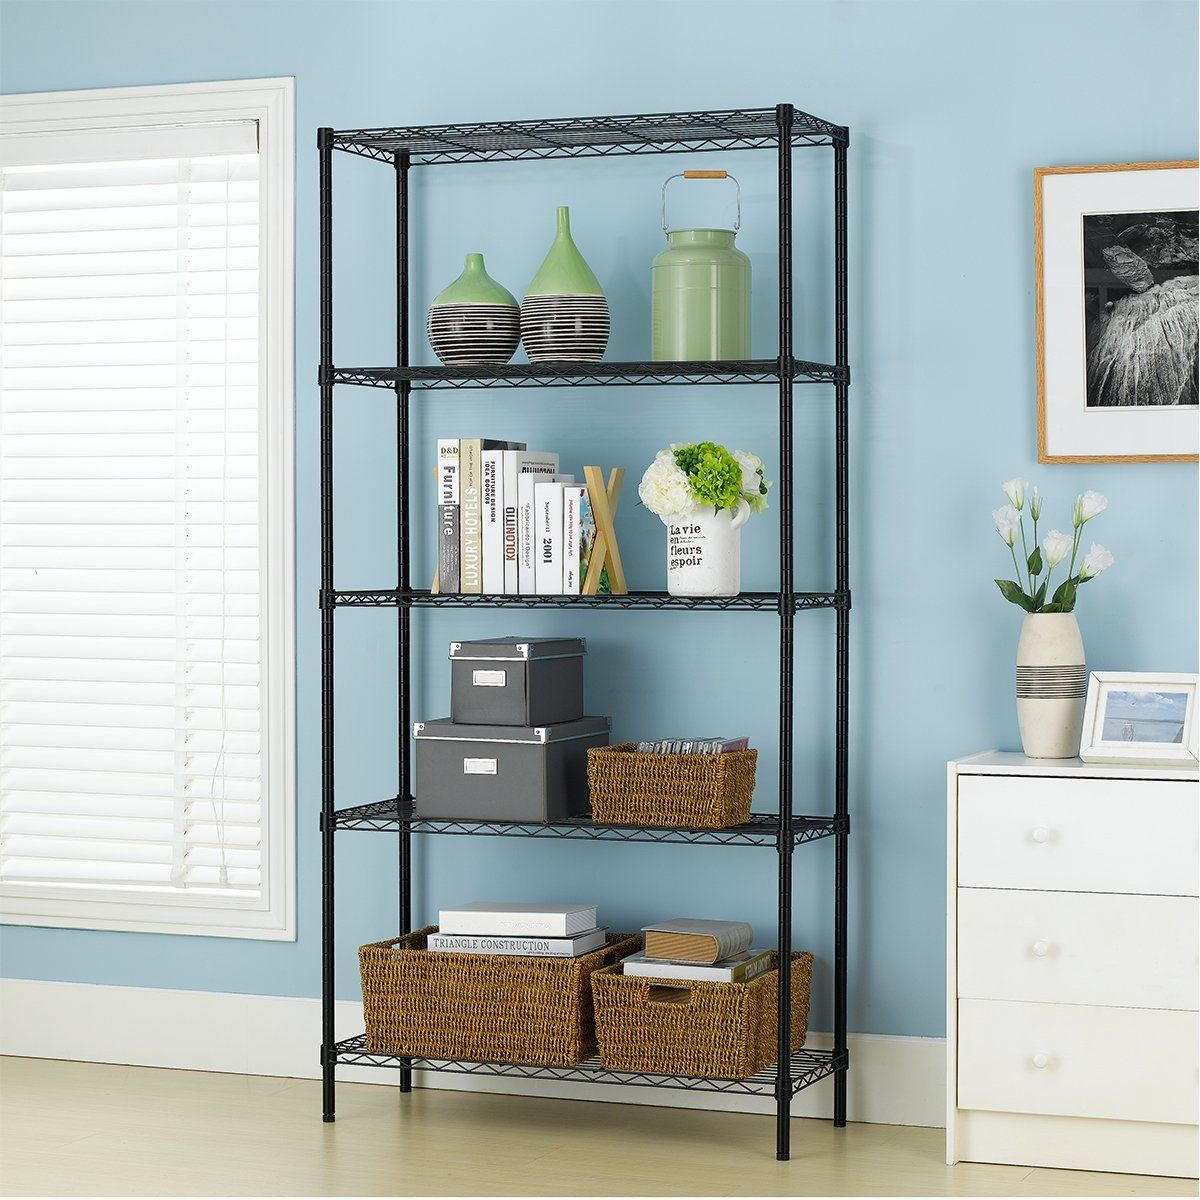 Amazon.com: PayLessHere Black 5 Shelf Adjustable Steel Shelving ...